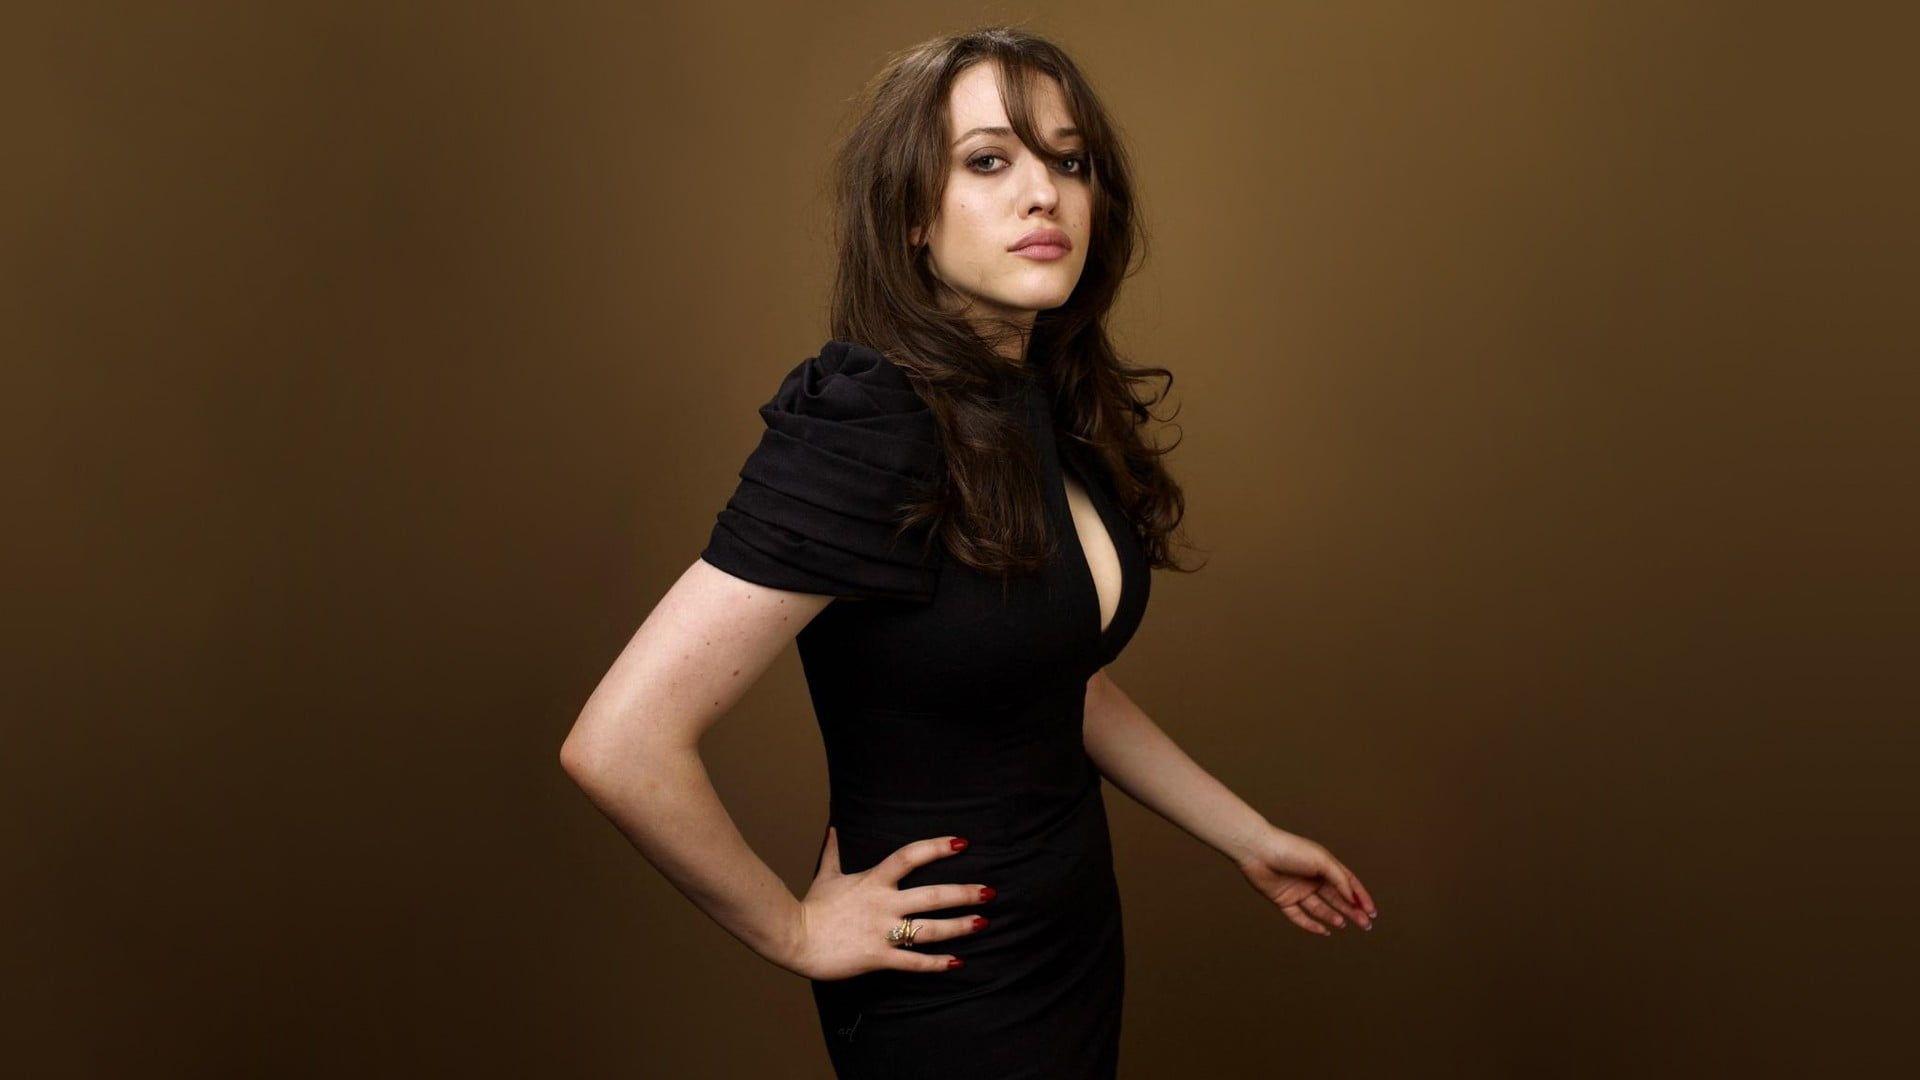 Hd Wallpaper Women S Black Dress Kat Dennings Brunette Womens Black Dress Black Dress Dresses [ 1080 x 1920 Pixel ]